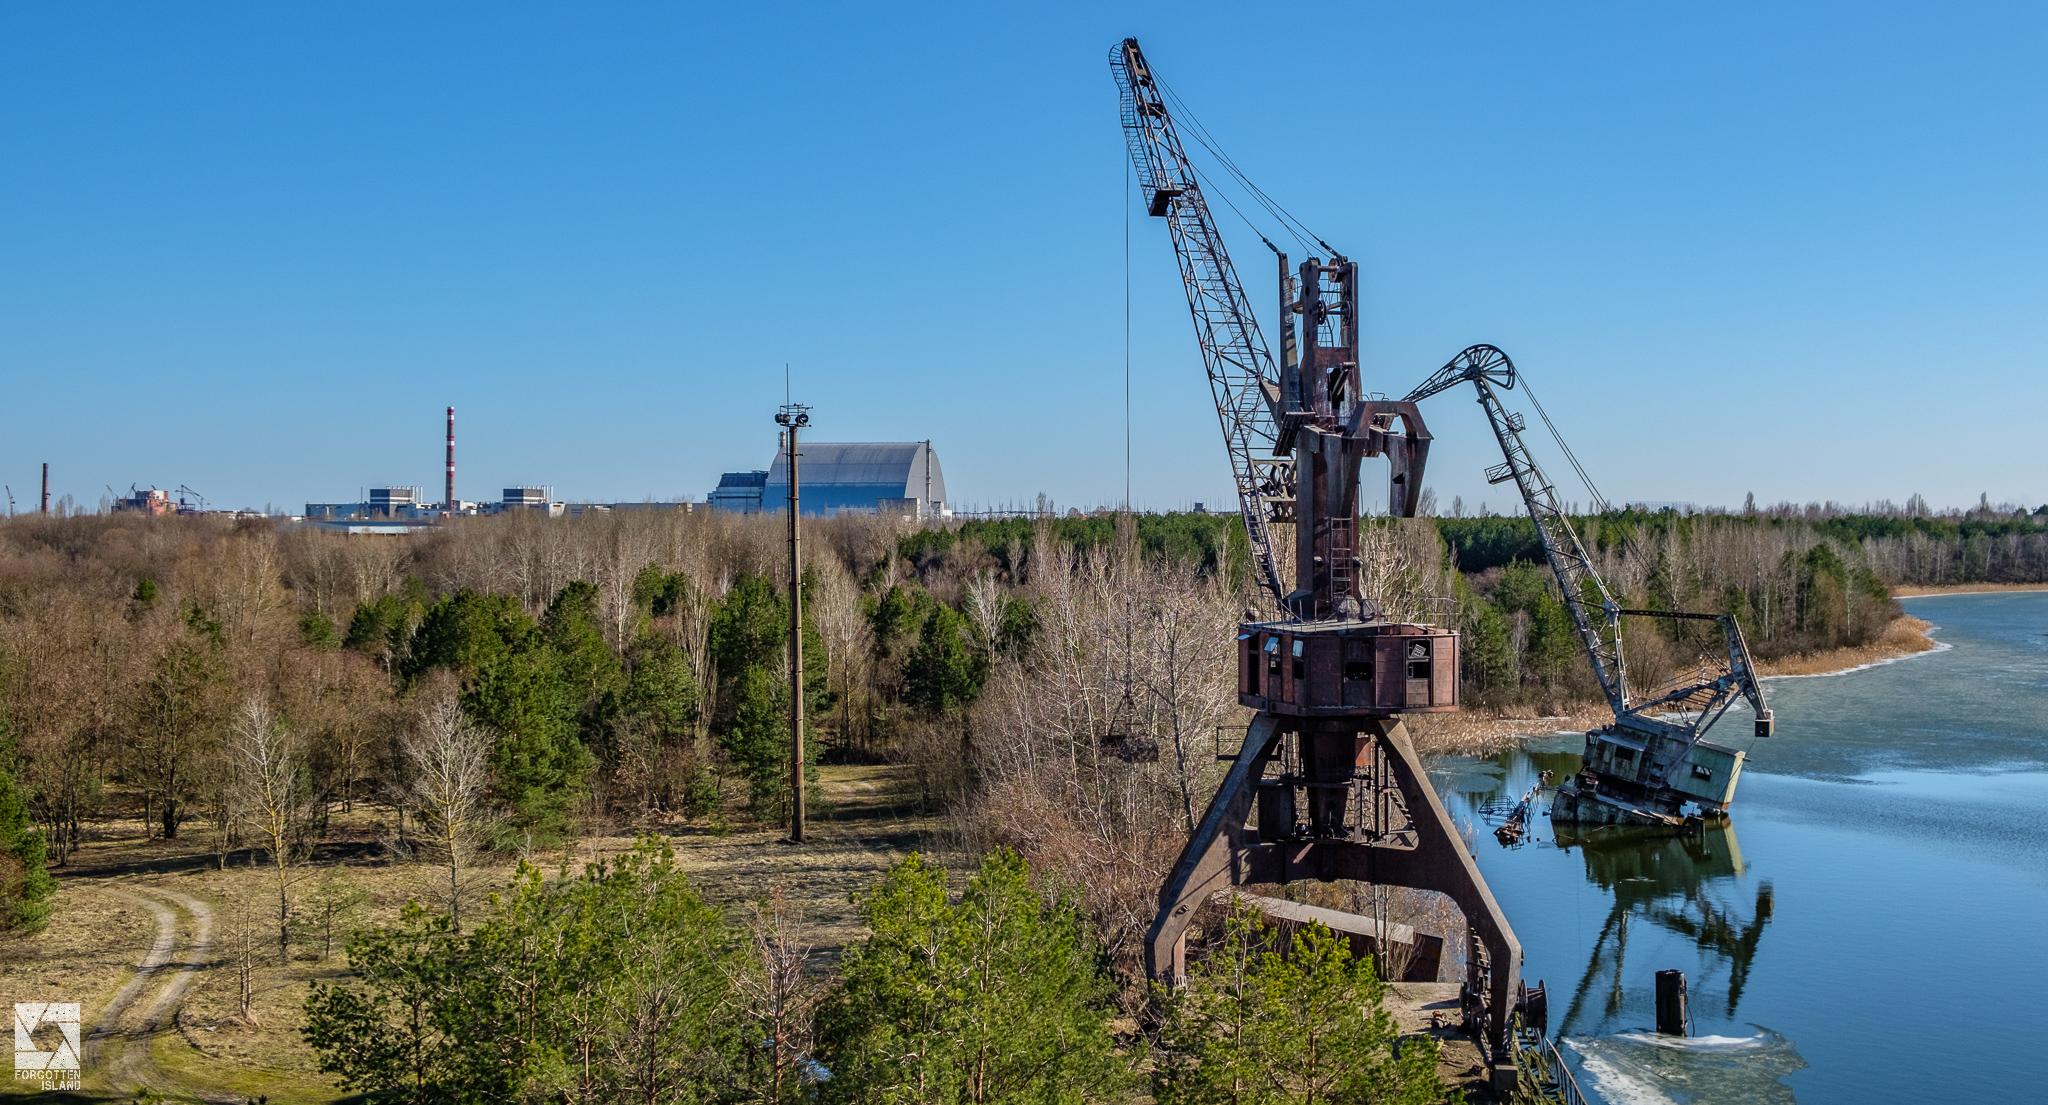 Pripyat Cargo Dock Cranes